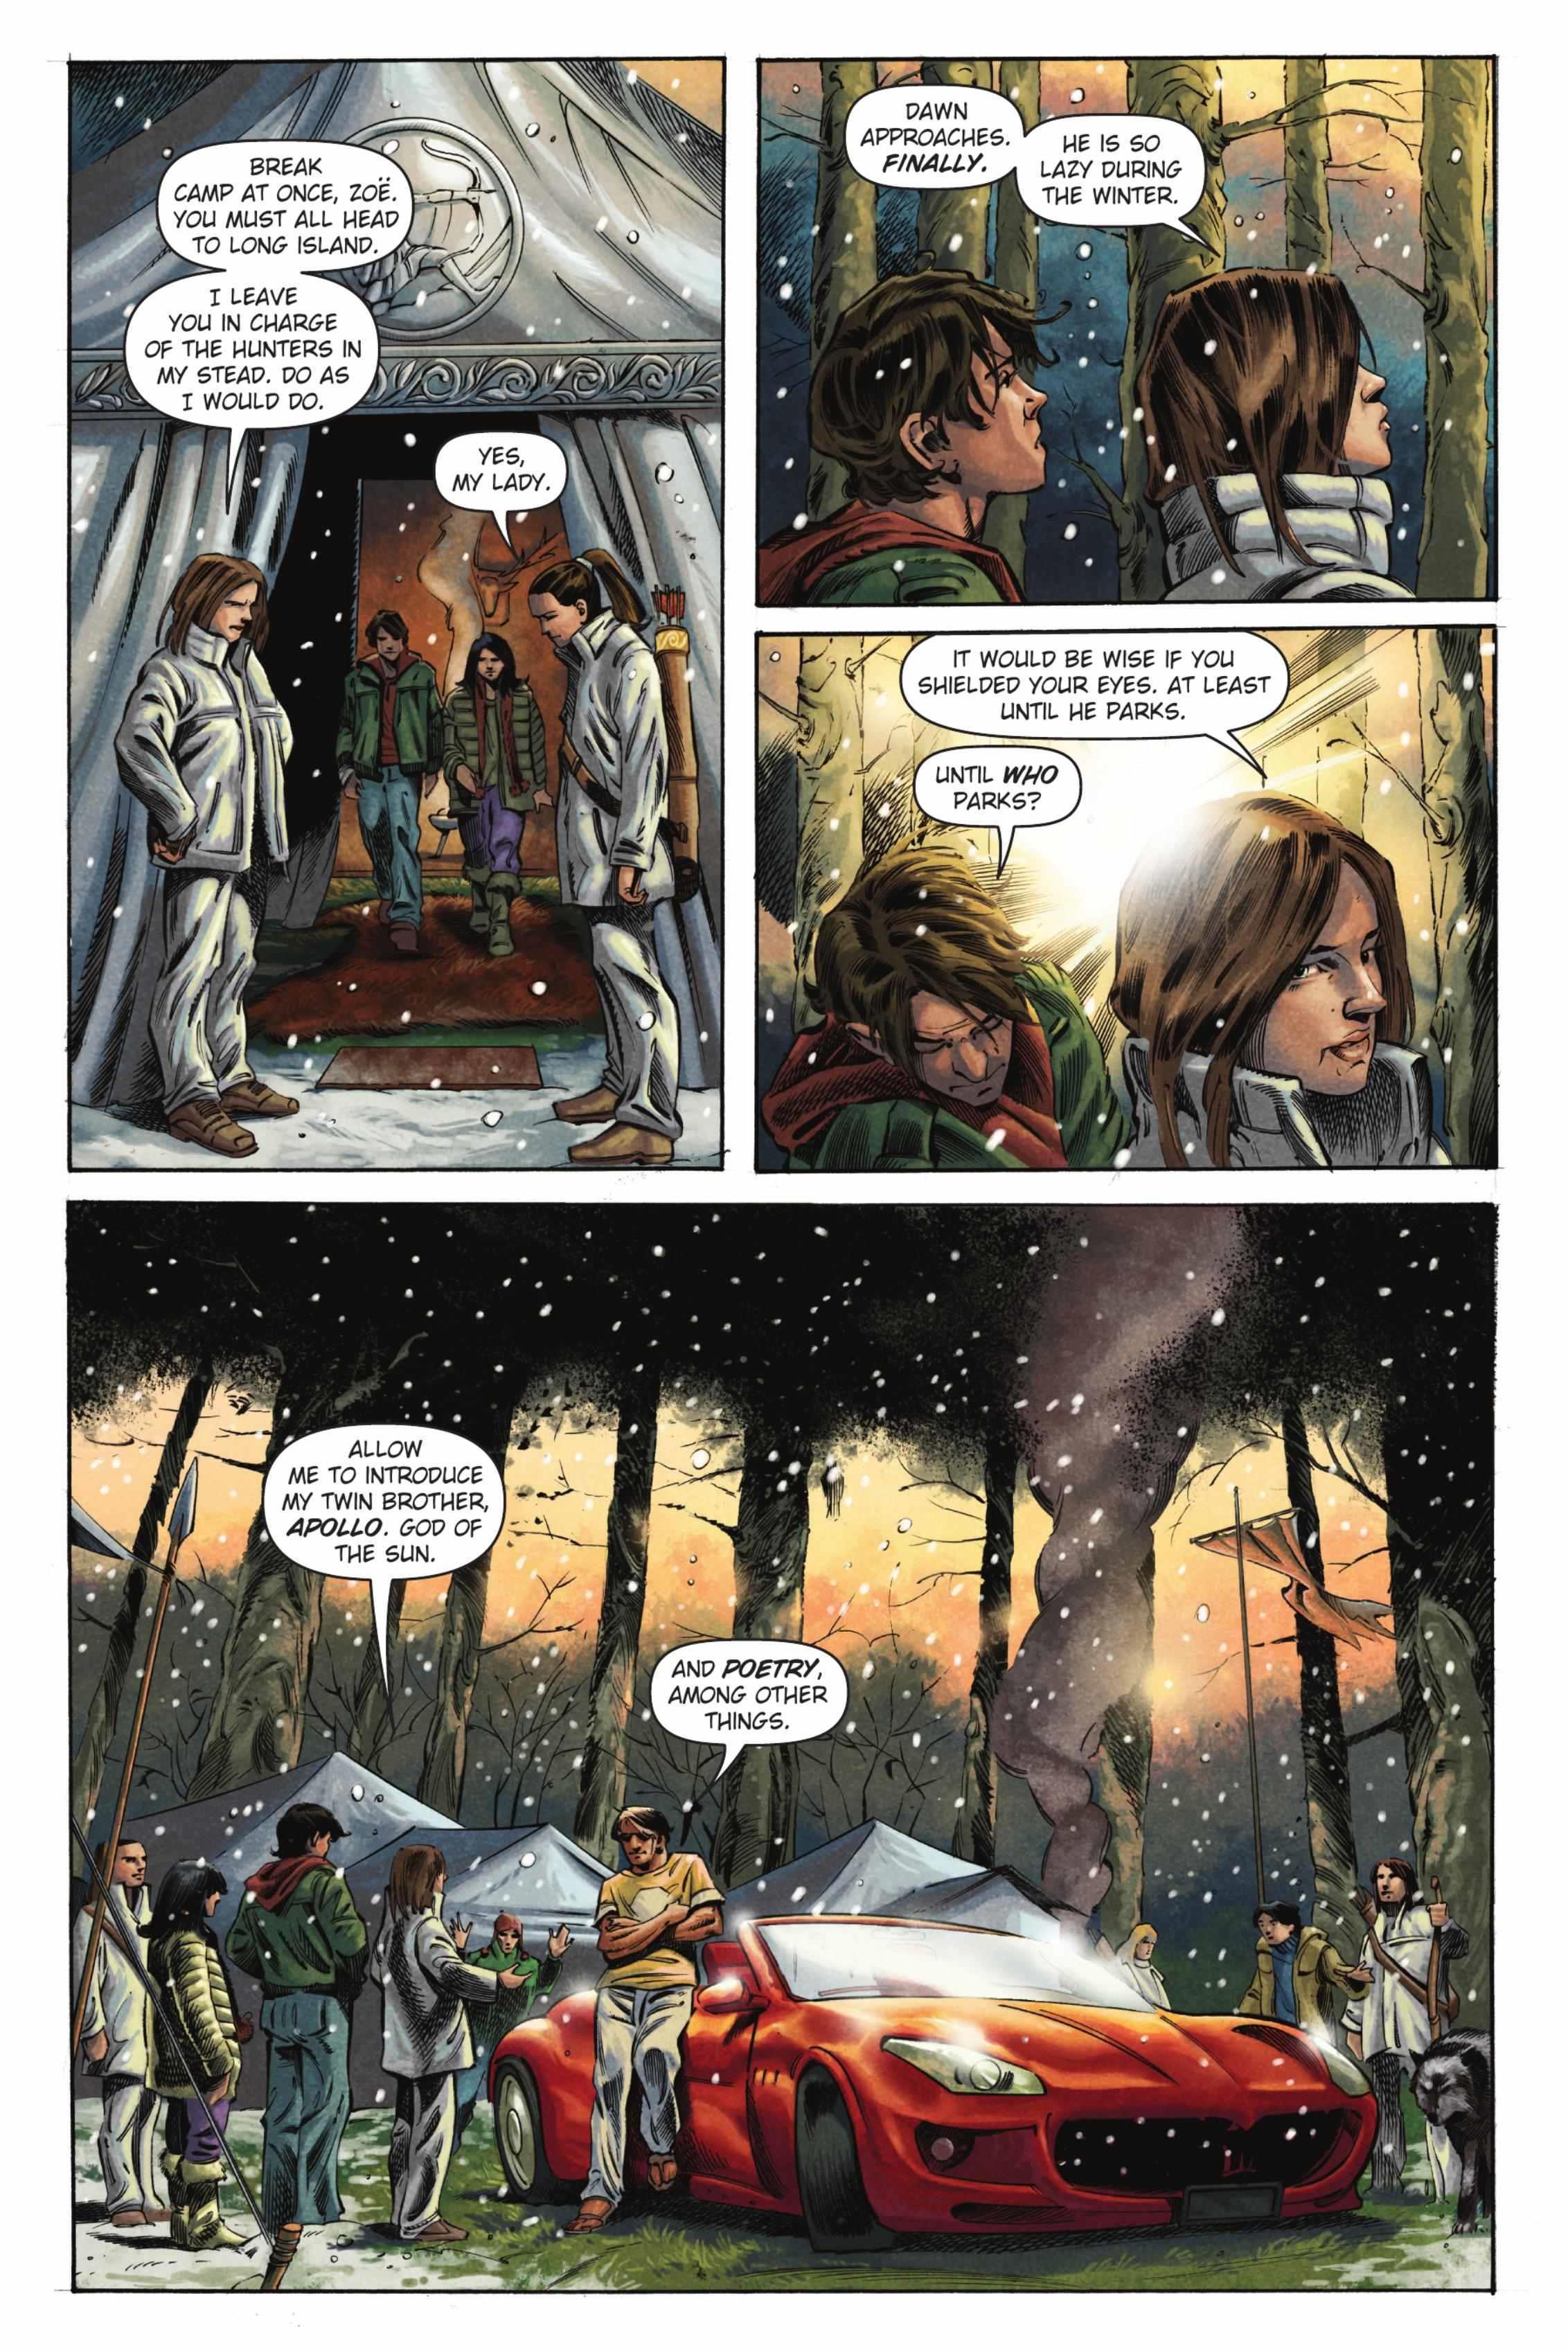 Percy Jackson The Titan's Curse graphic novel review